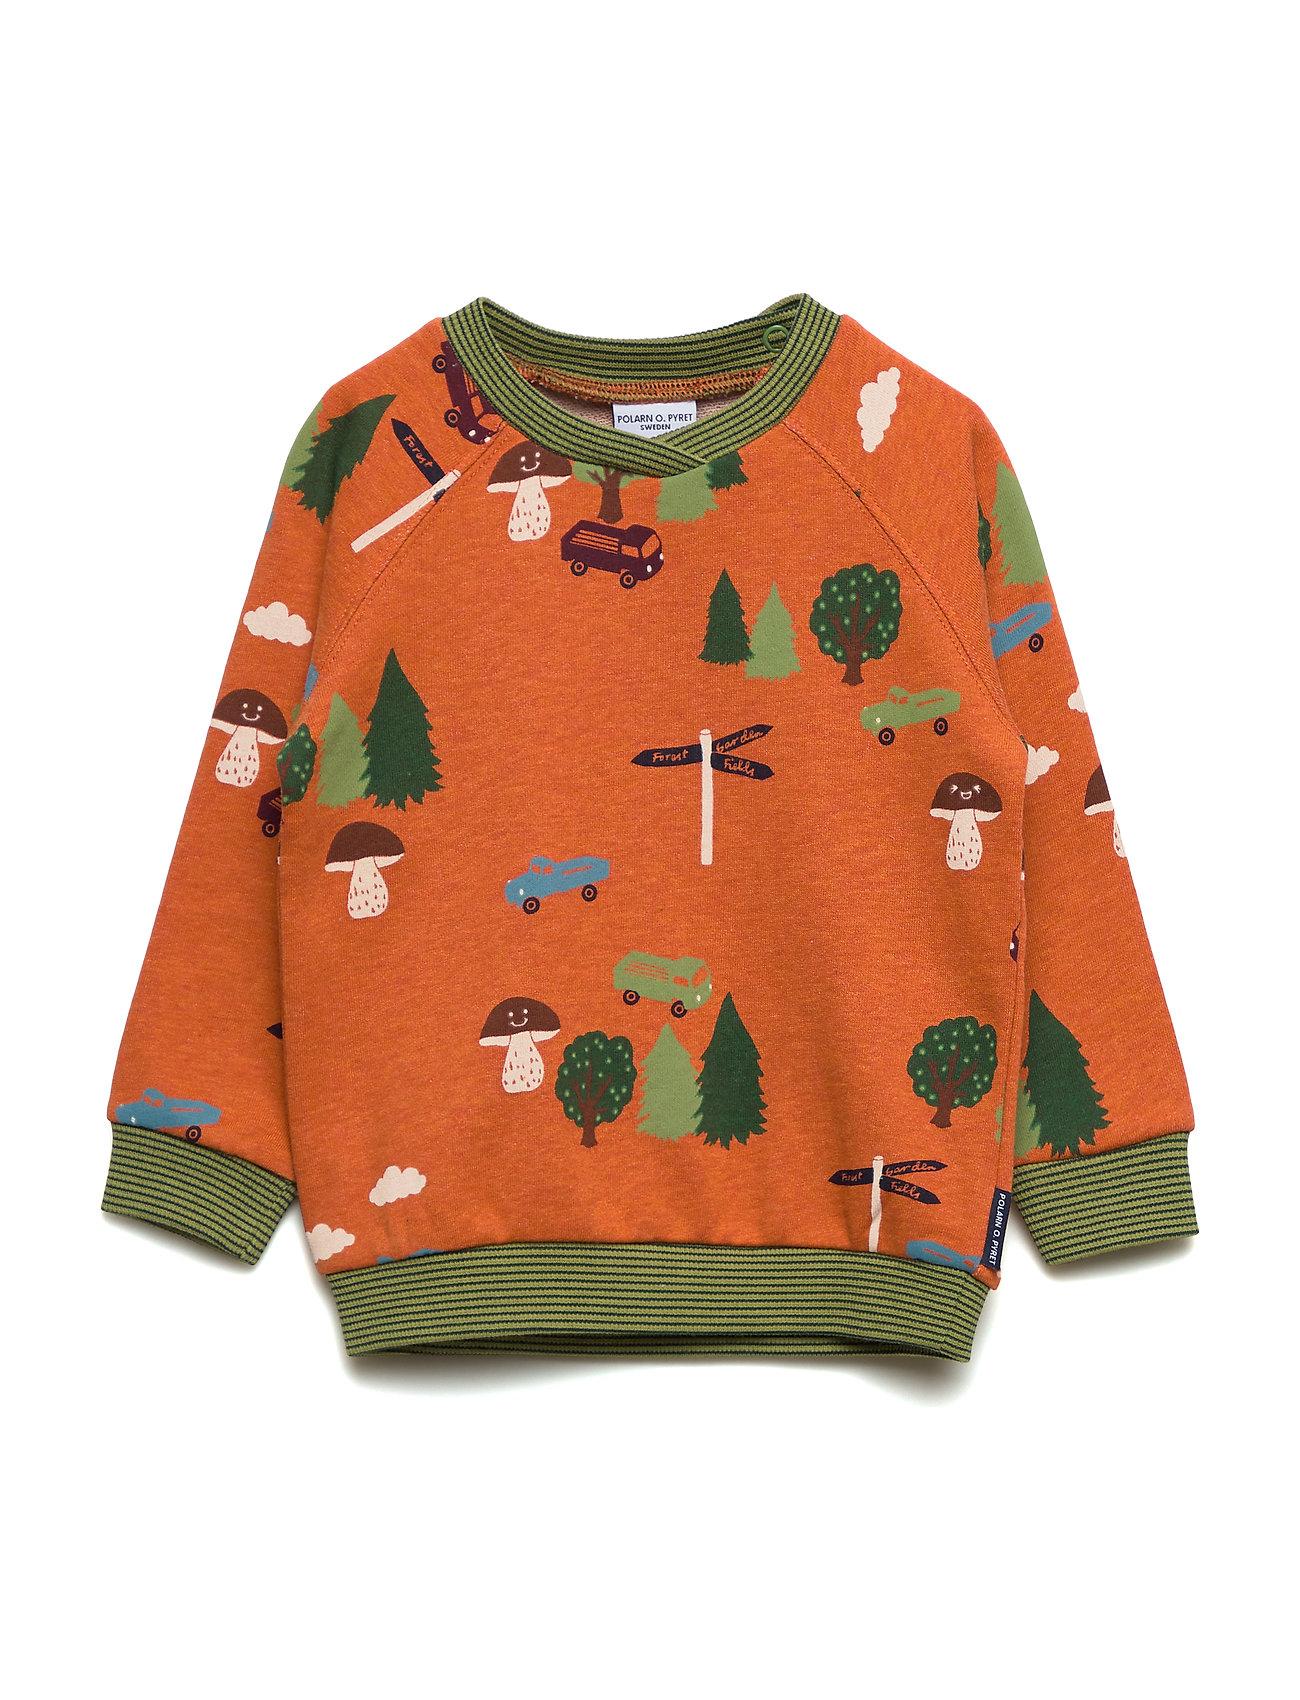 Polarn O. Pyret Sweater W APO Preschool - BURNT BRICK